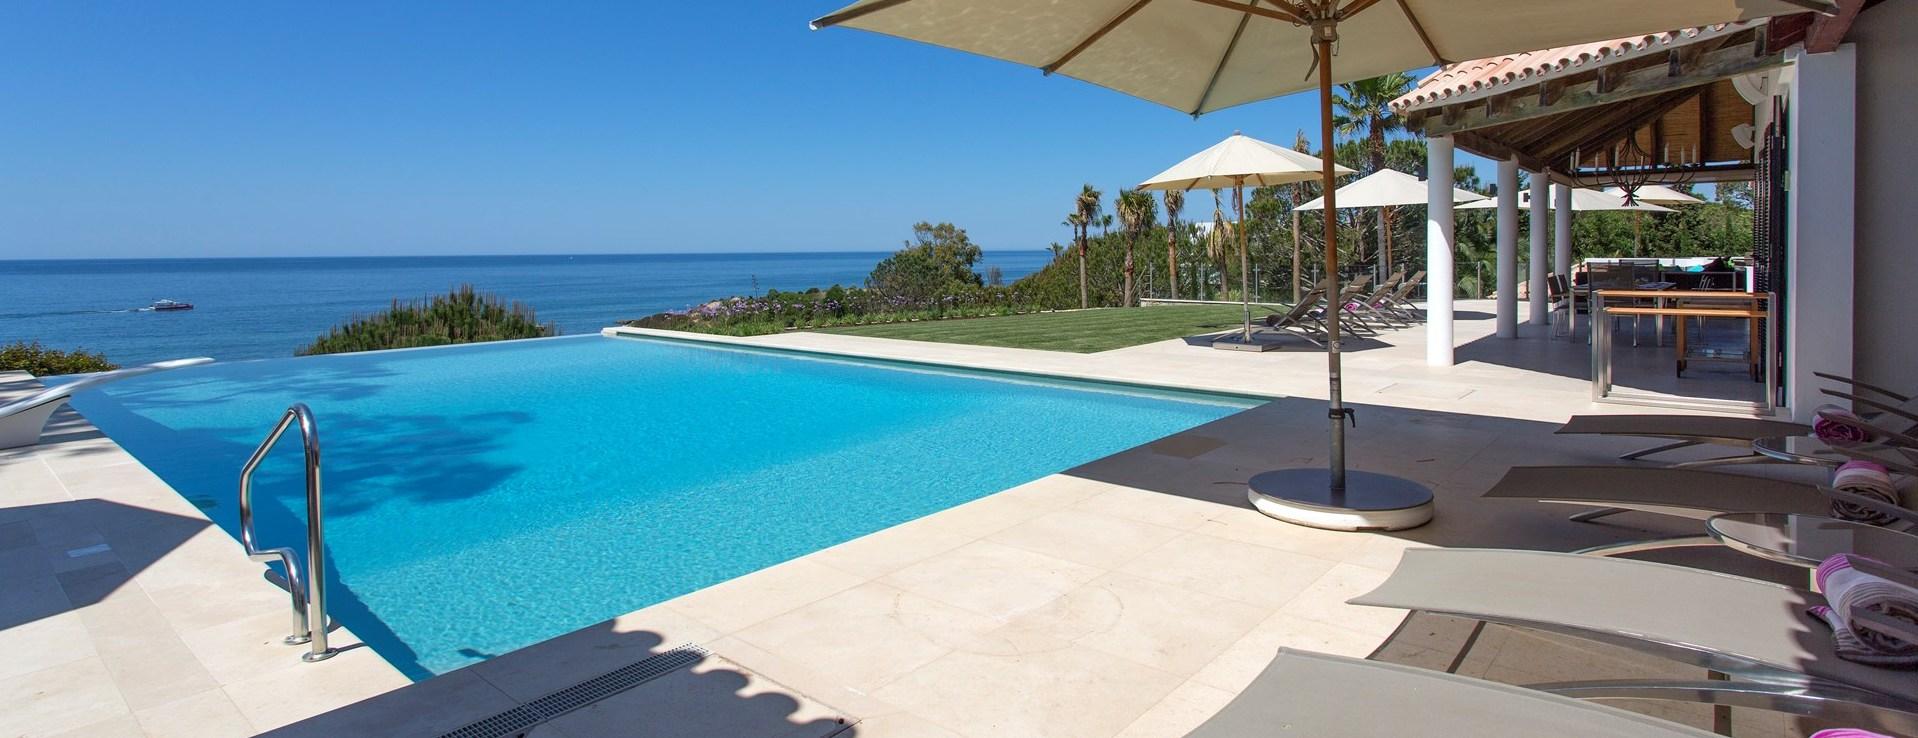 luxury-villa-holidays-algarve